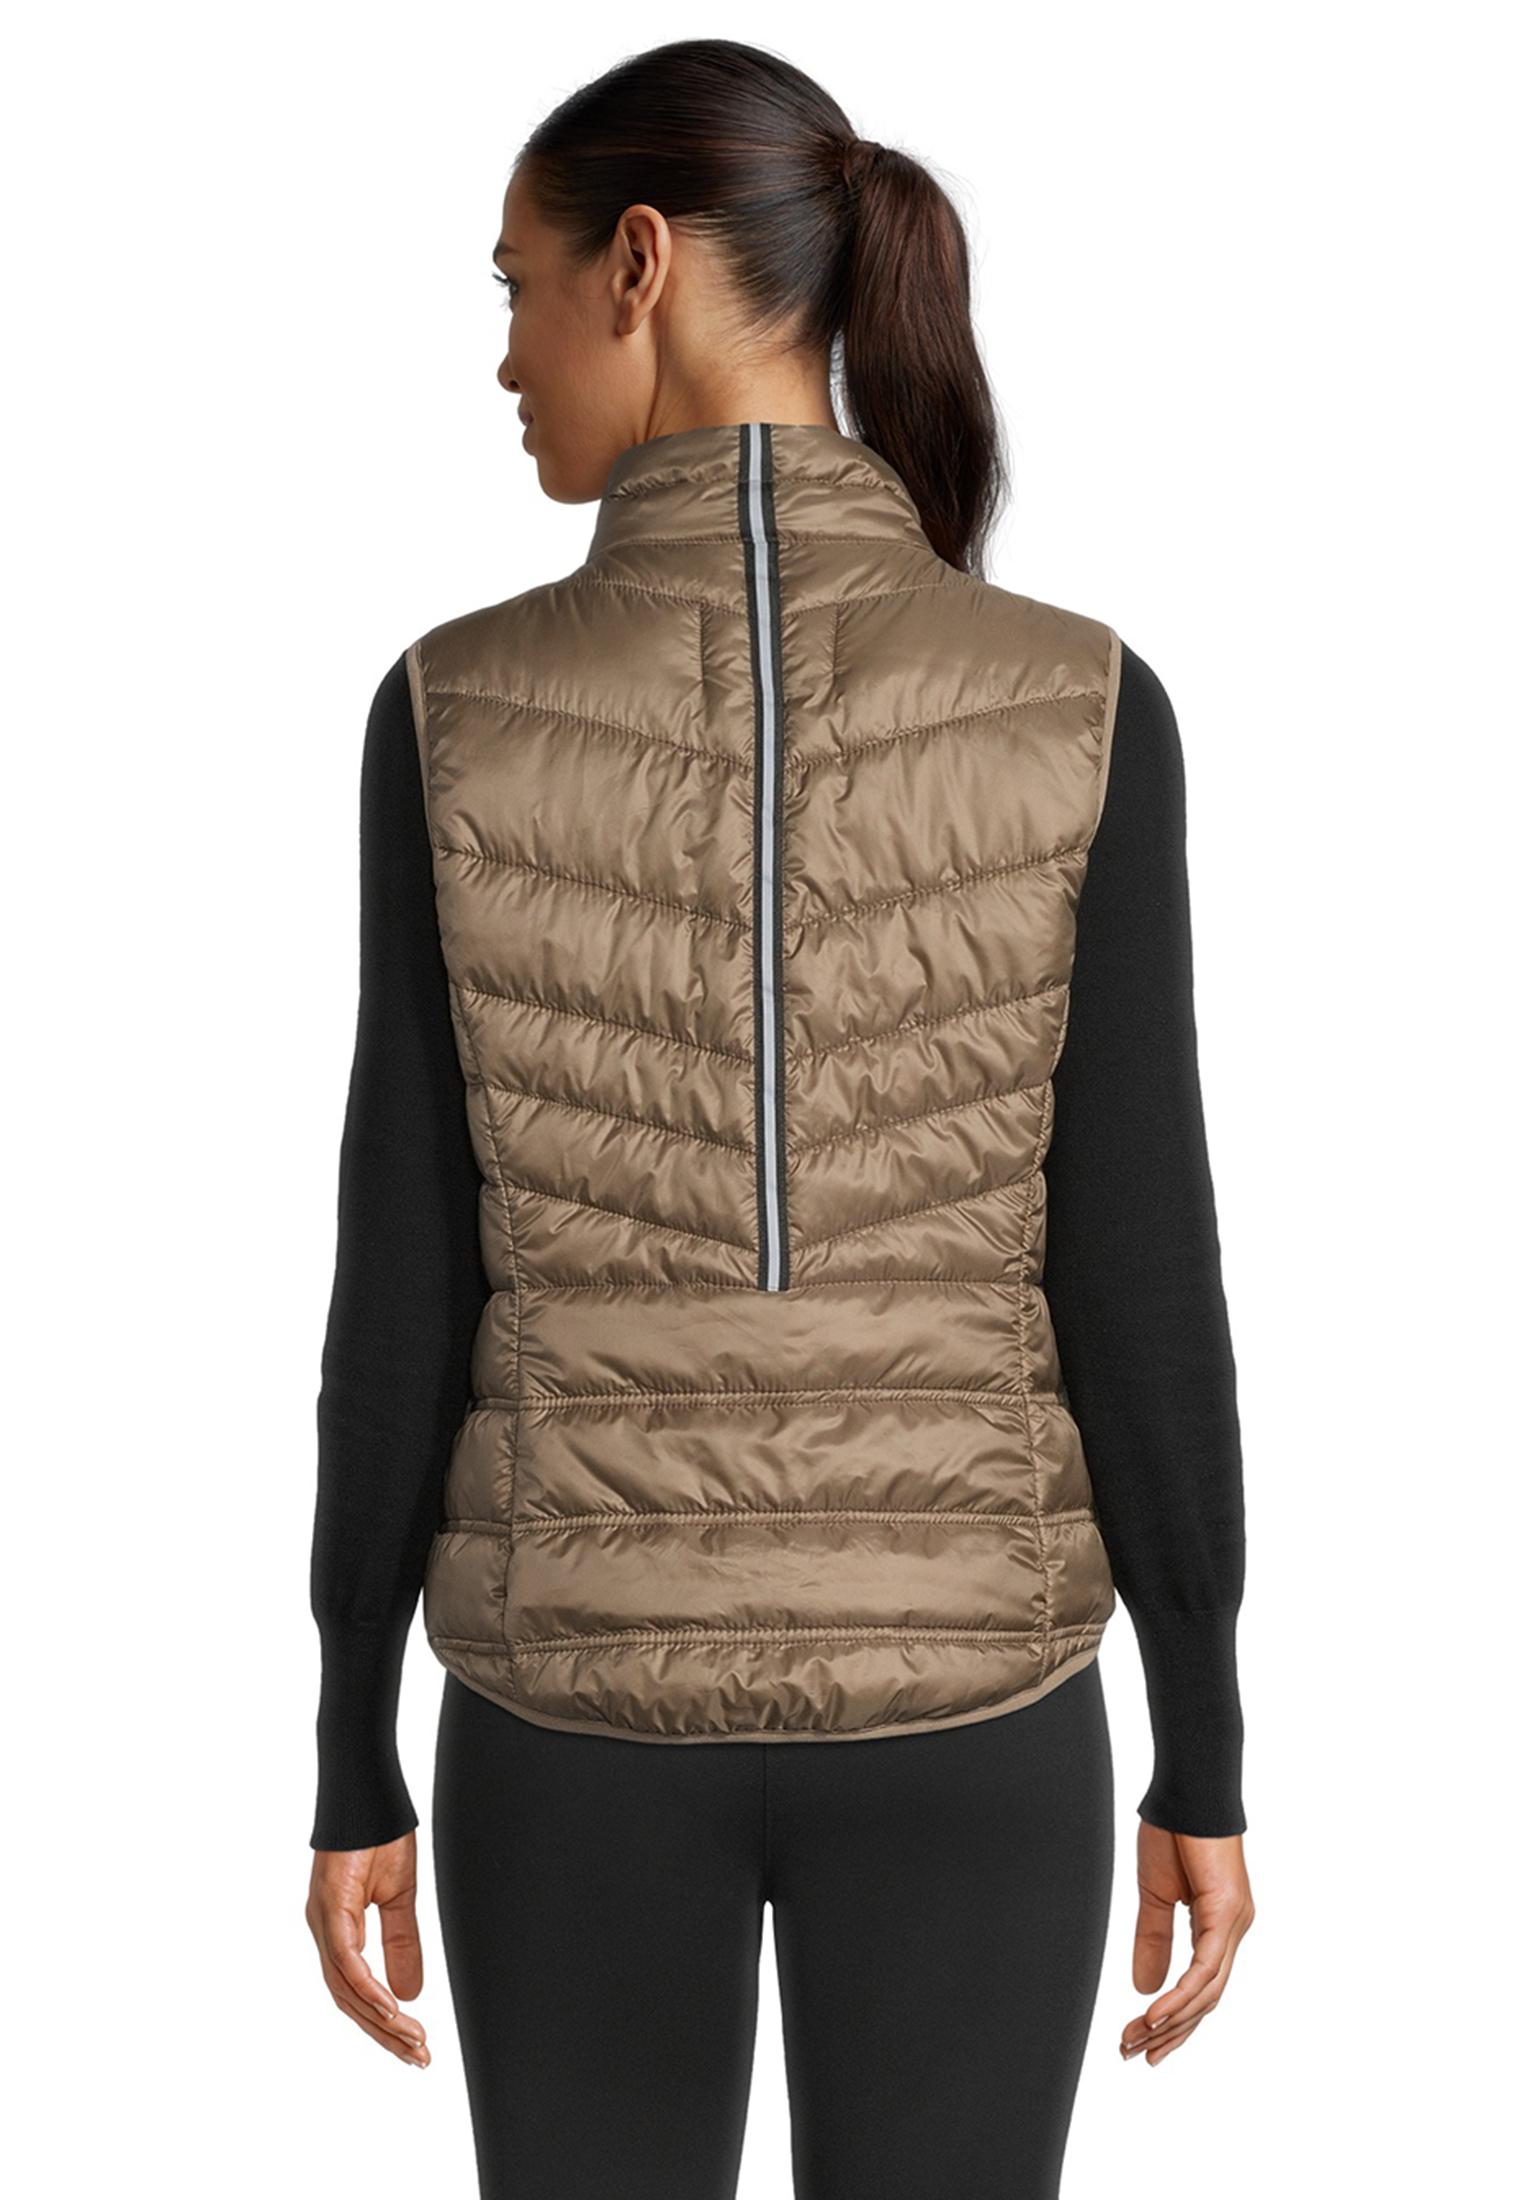 Betty Barclay 72122576 vest, bright camel, 36